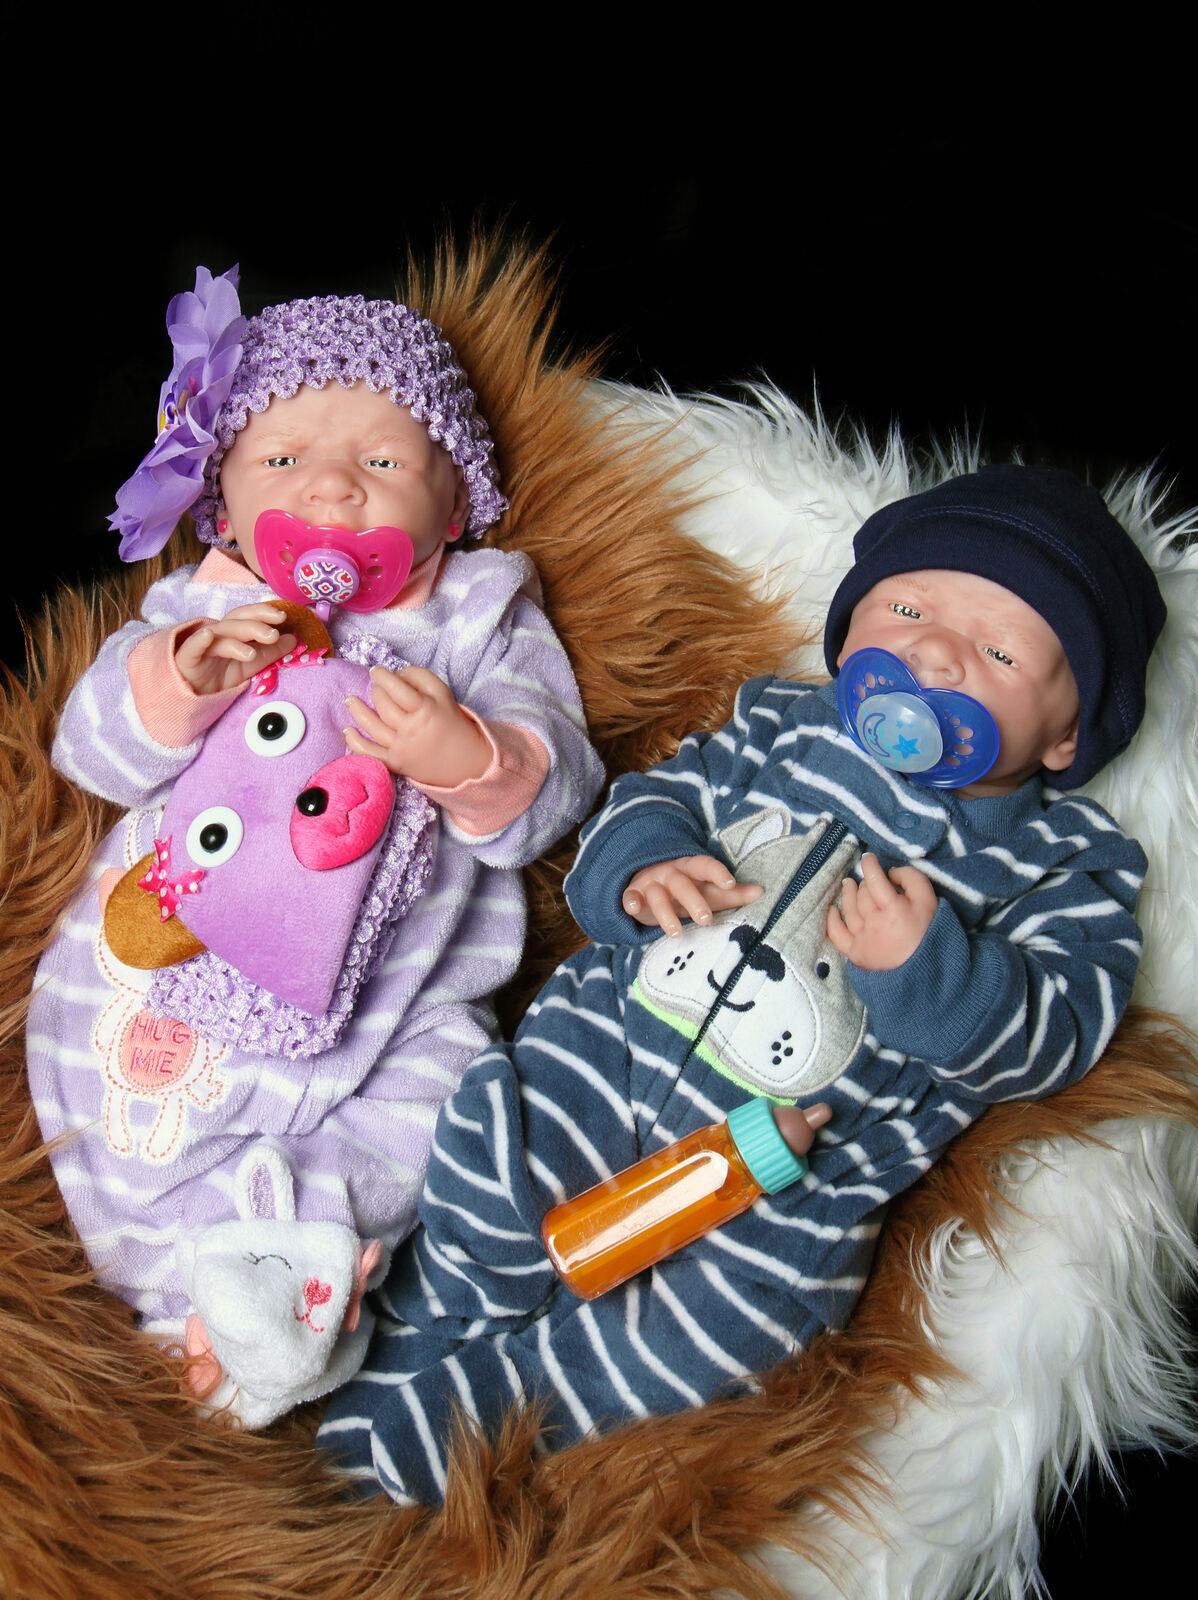 Bebés Reborn Twin boy & girl doll preemie 15  pulgadas Lavable Berenguer realista